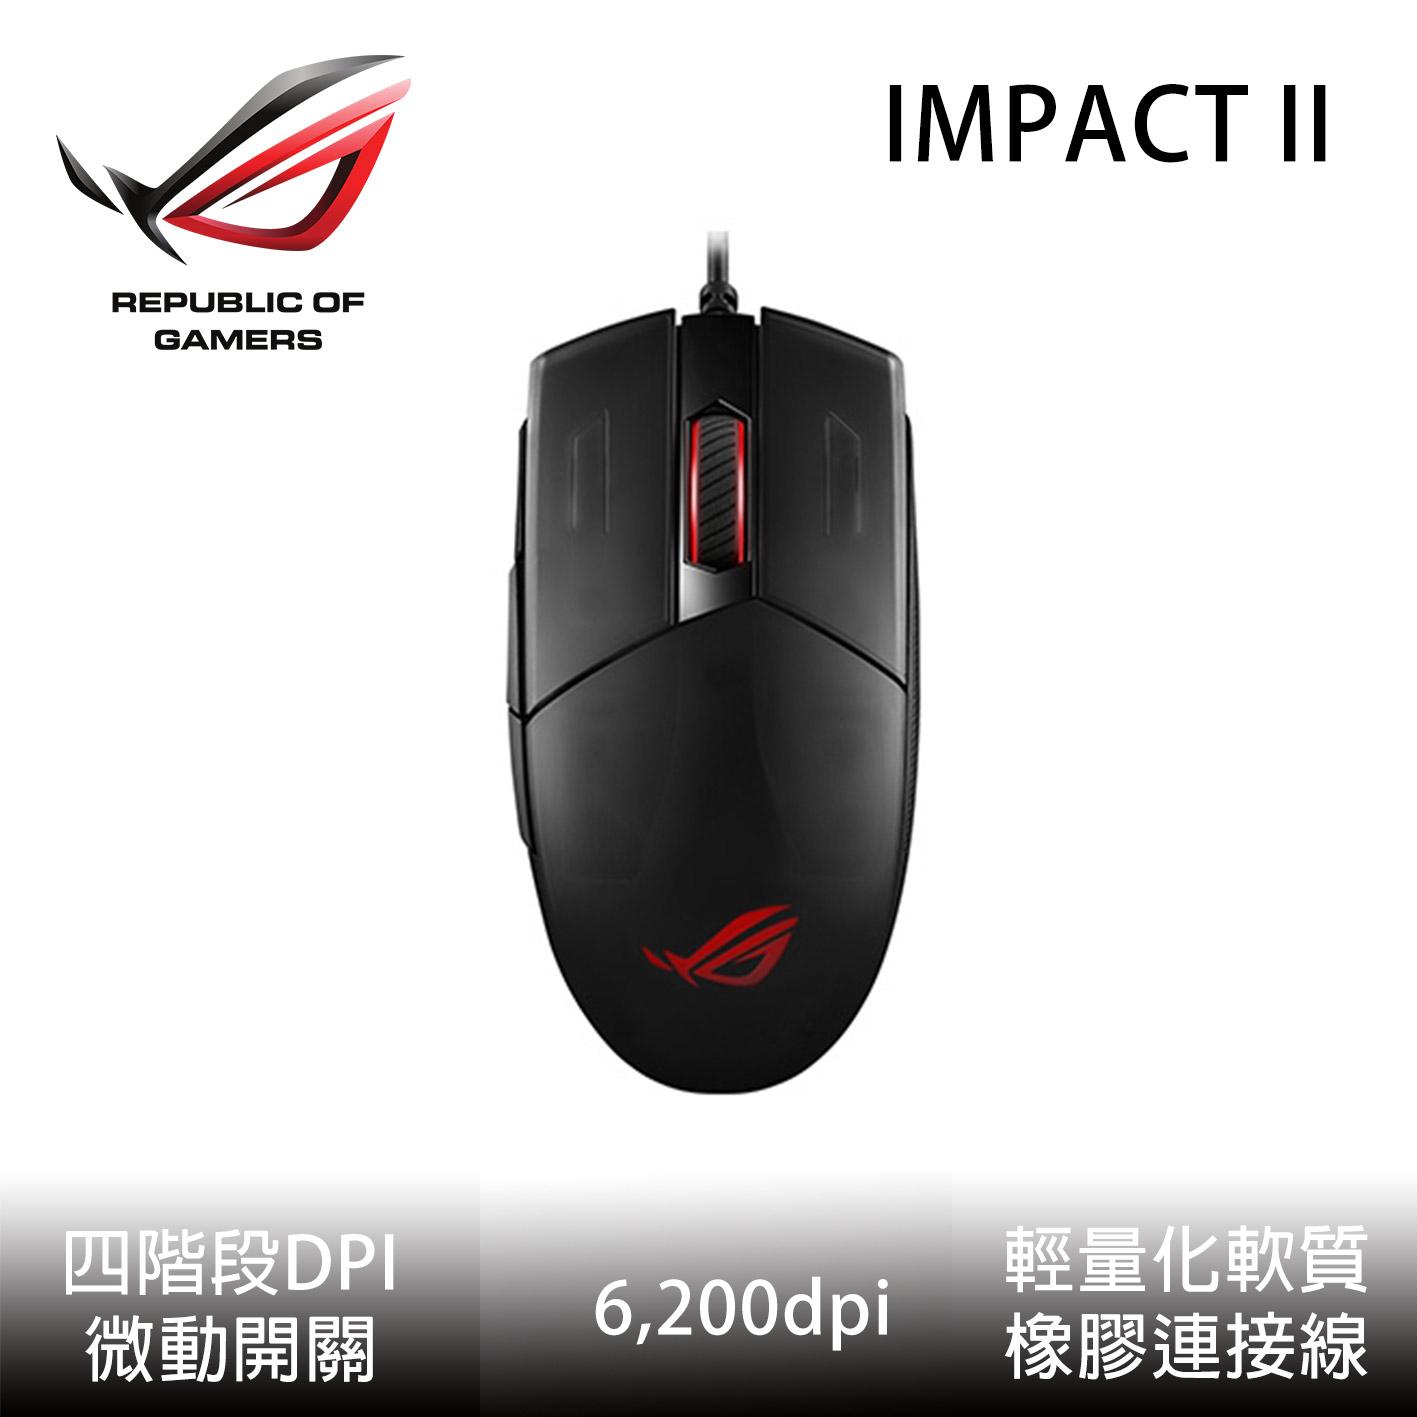 ASUS華碩 ROG STRIX IMPACT II RGB電競滑鼠